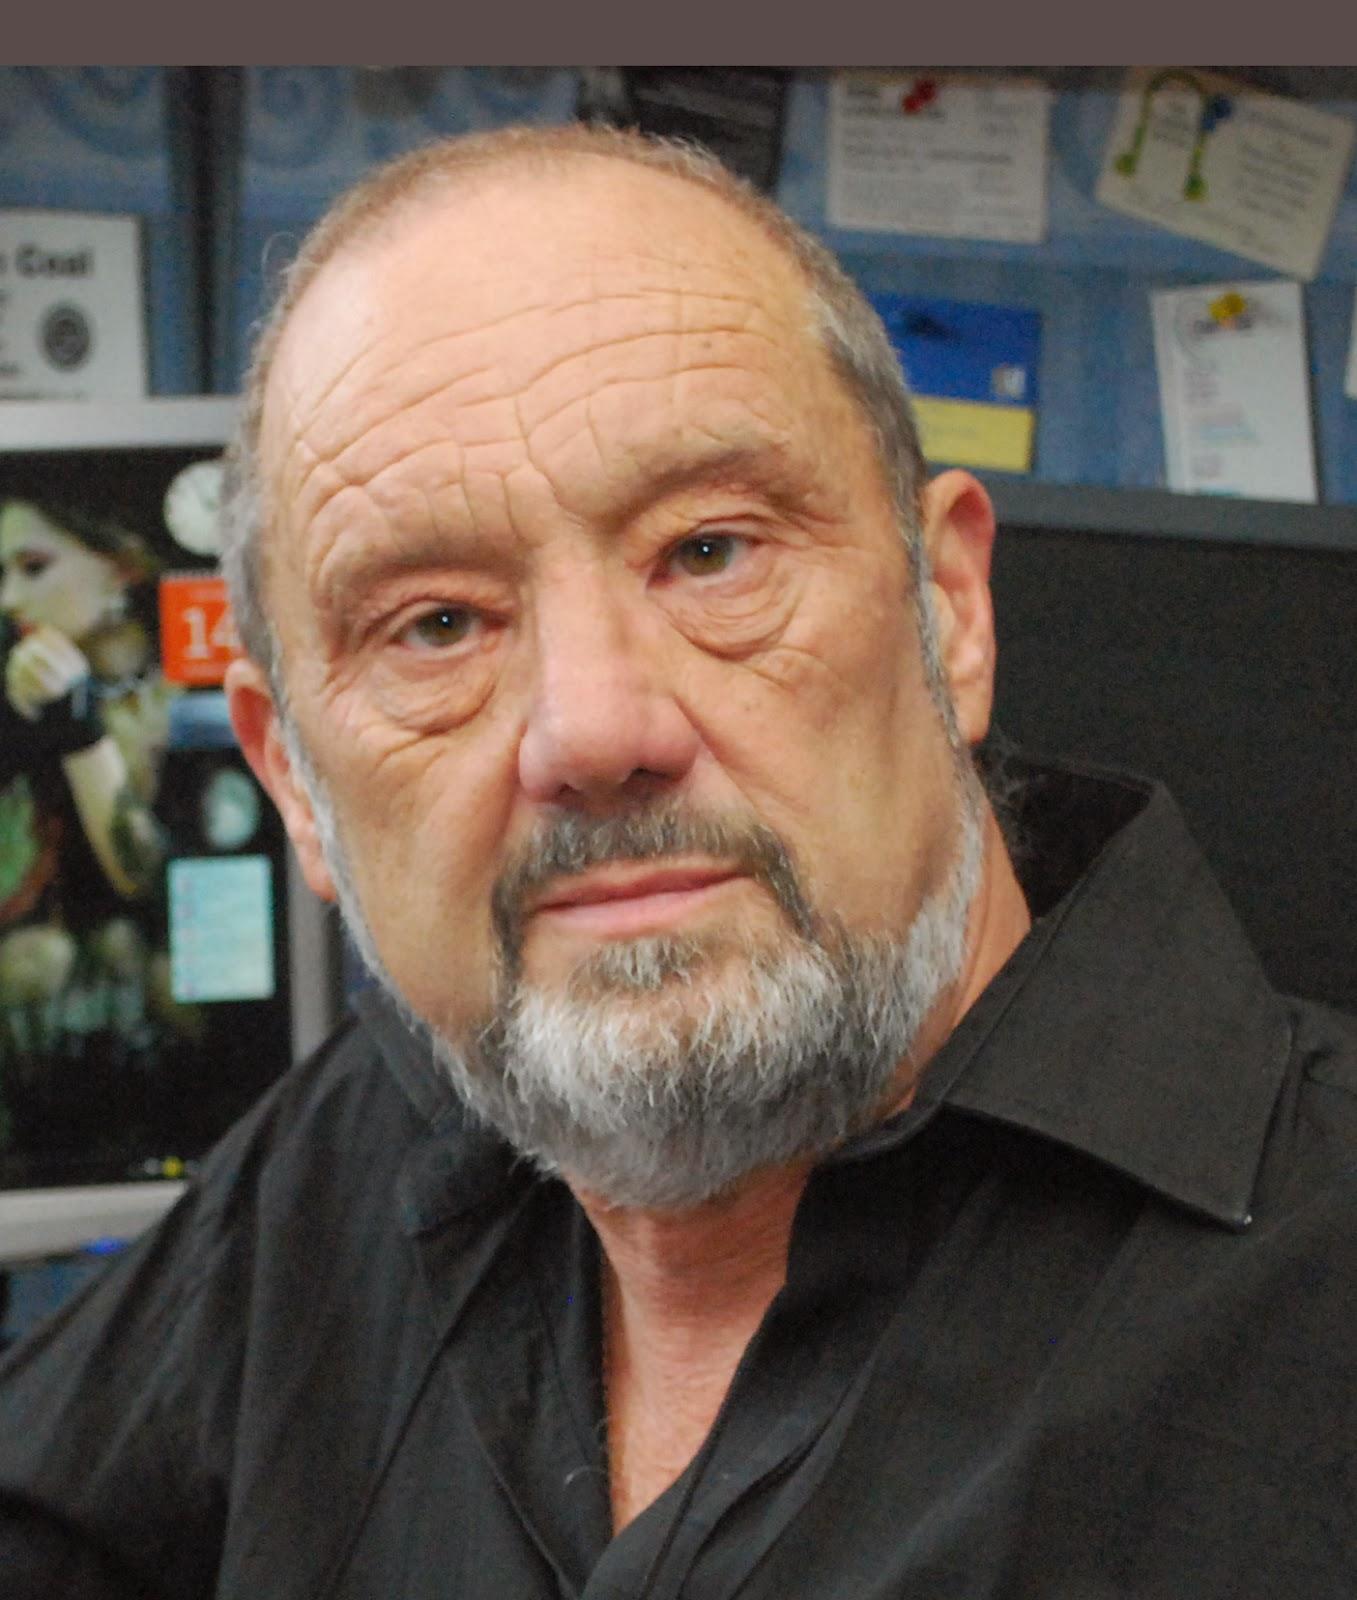 Interview with Barry Durham, www.writersandauthors.info